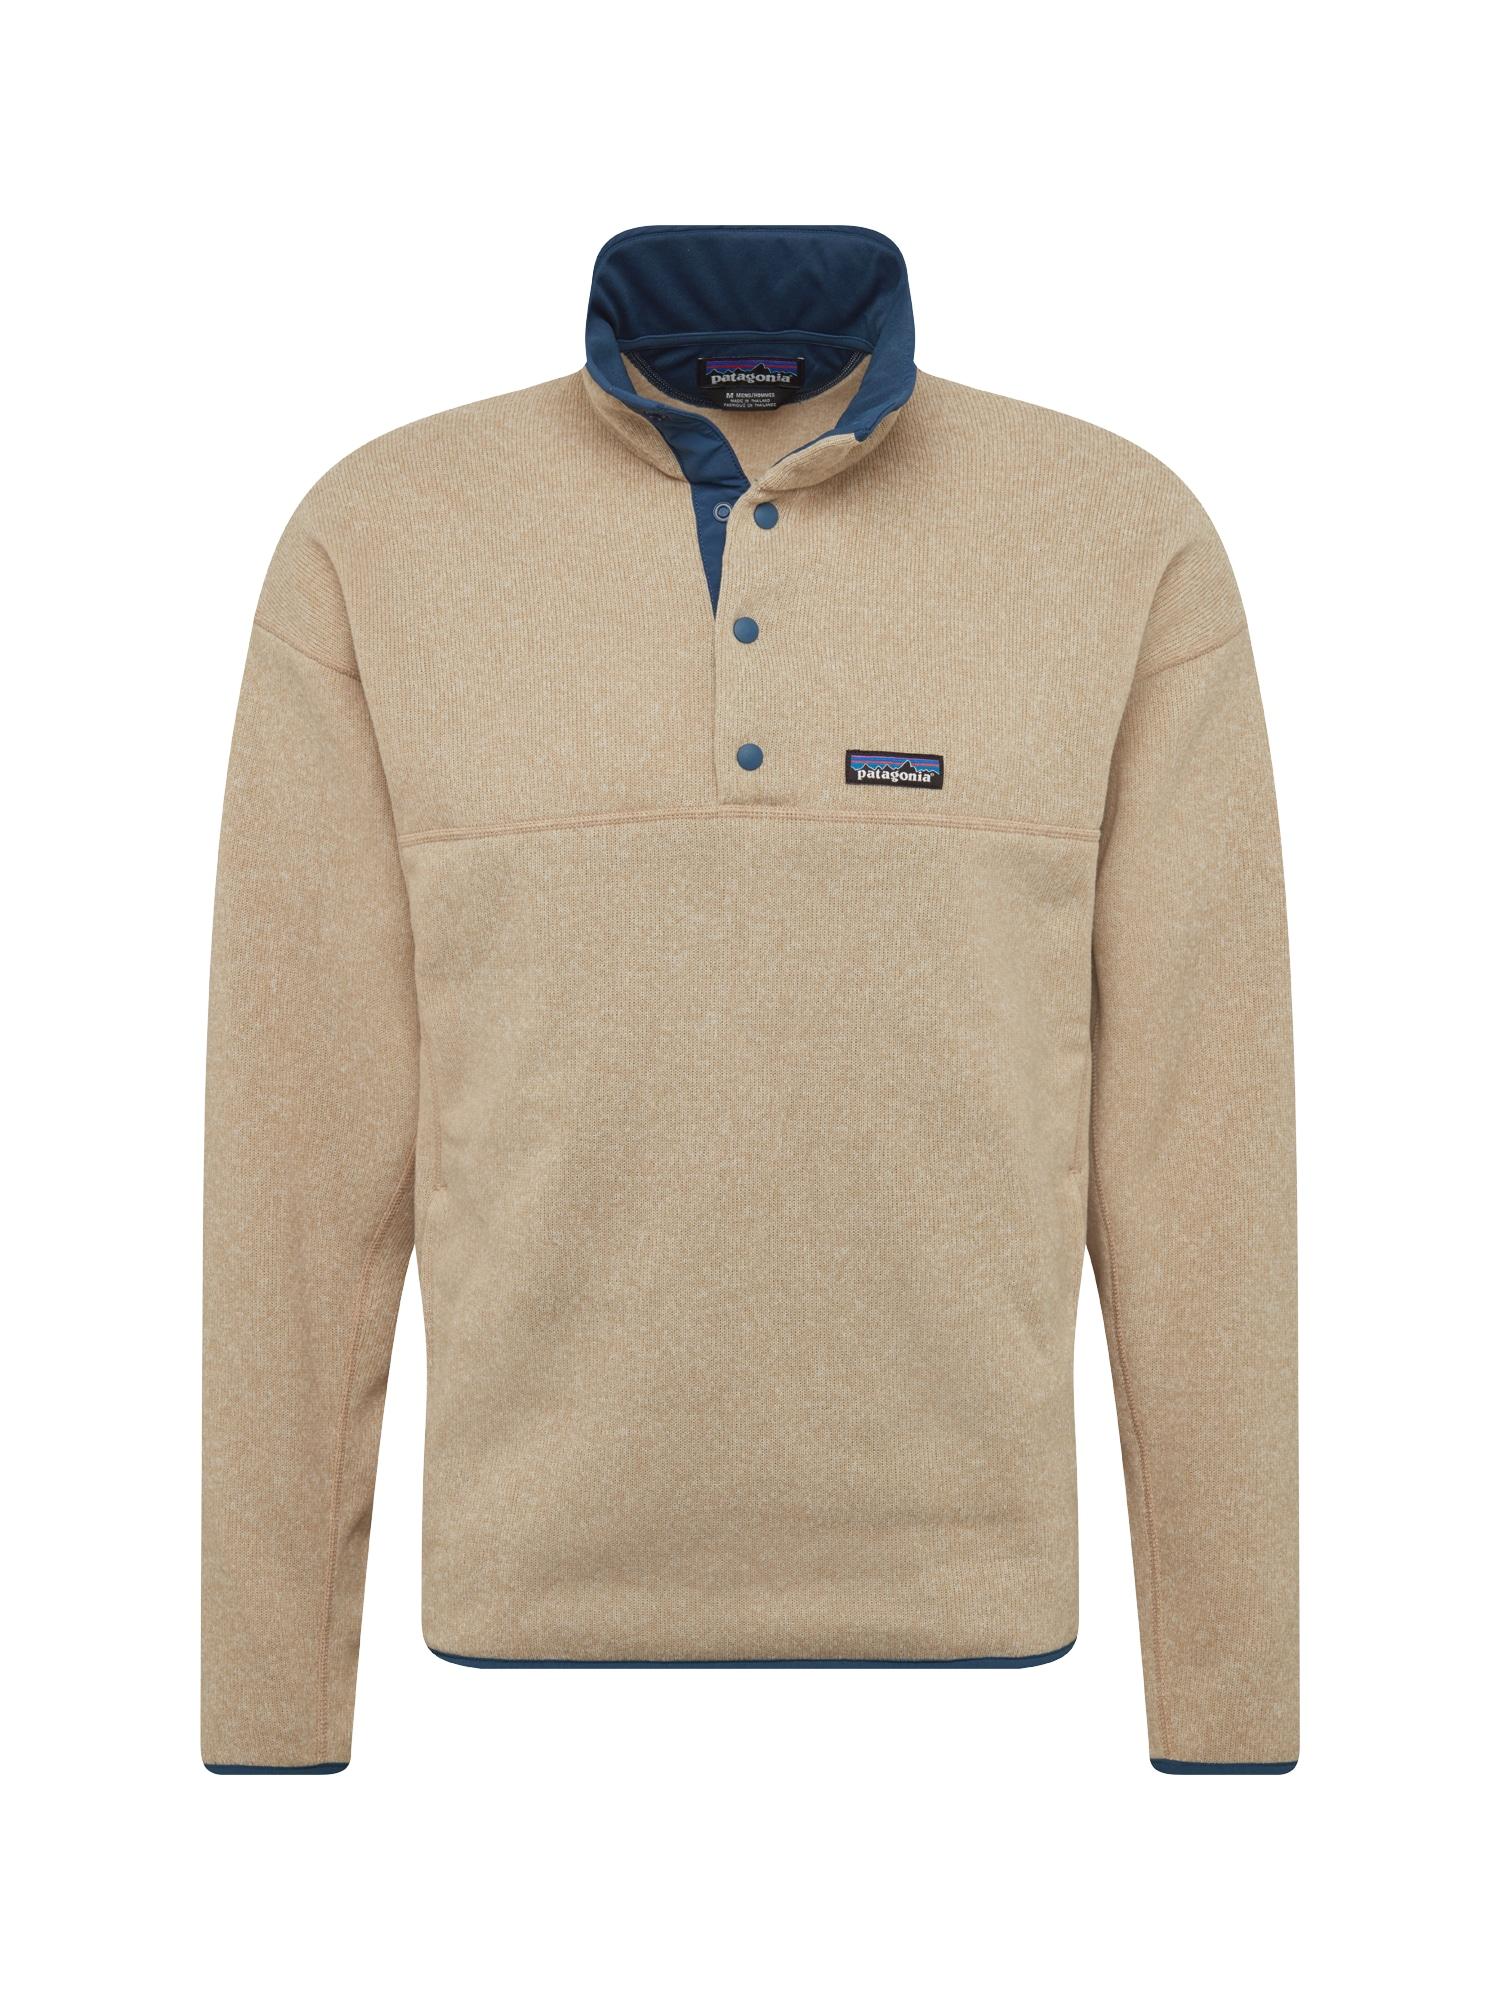 Svetr Ms LW Better Sweater Marsupial PO světle béžová PATAGONIA